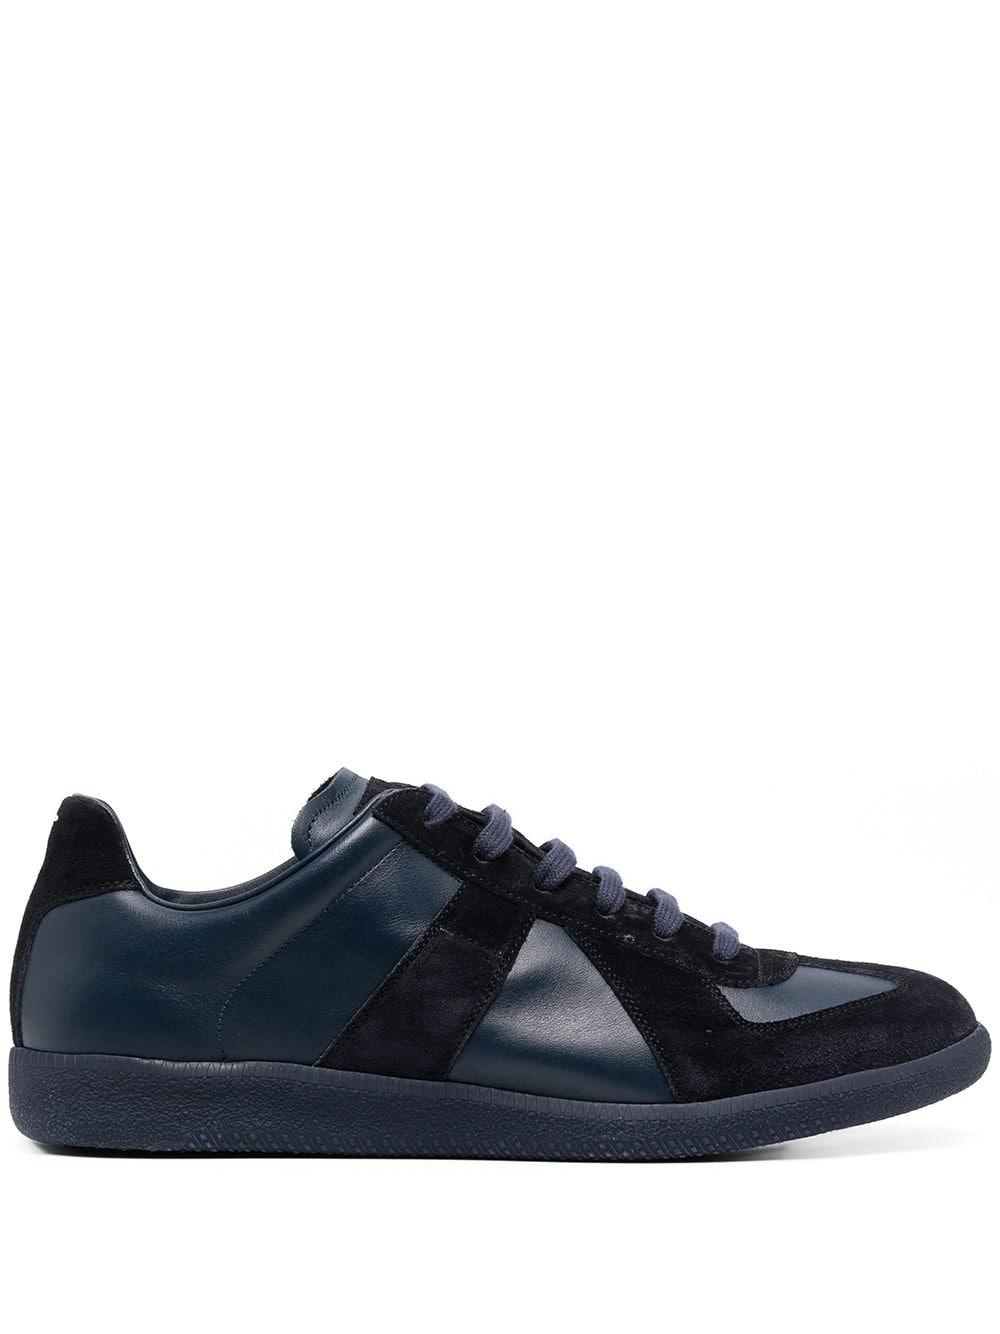 Maison Margiela sneakers replica uomo MAISON MARGIELA | Sneakers | S57WS0236 P1897H8543